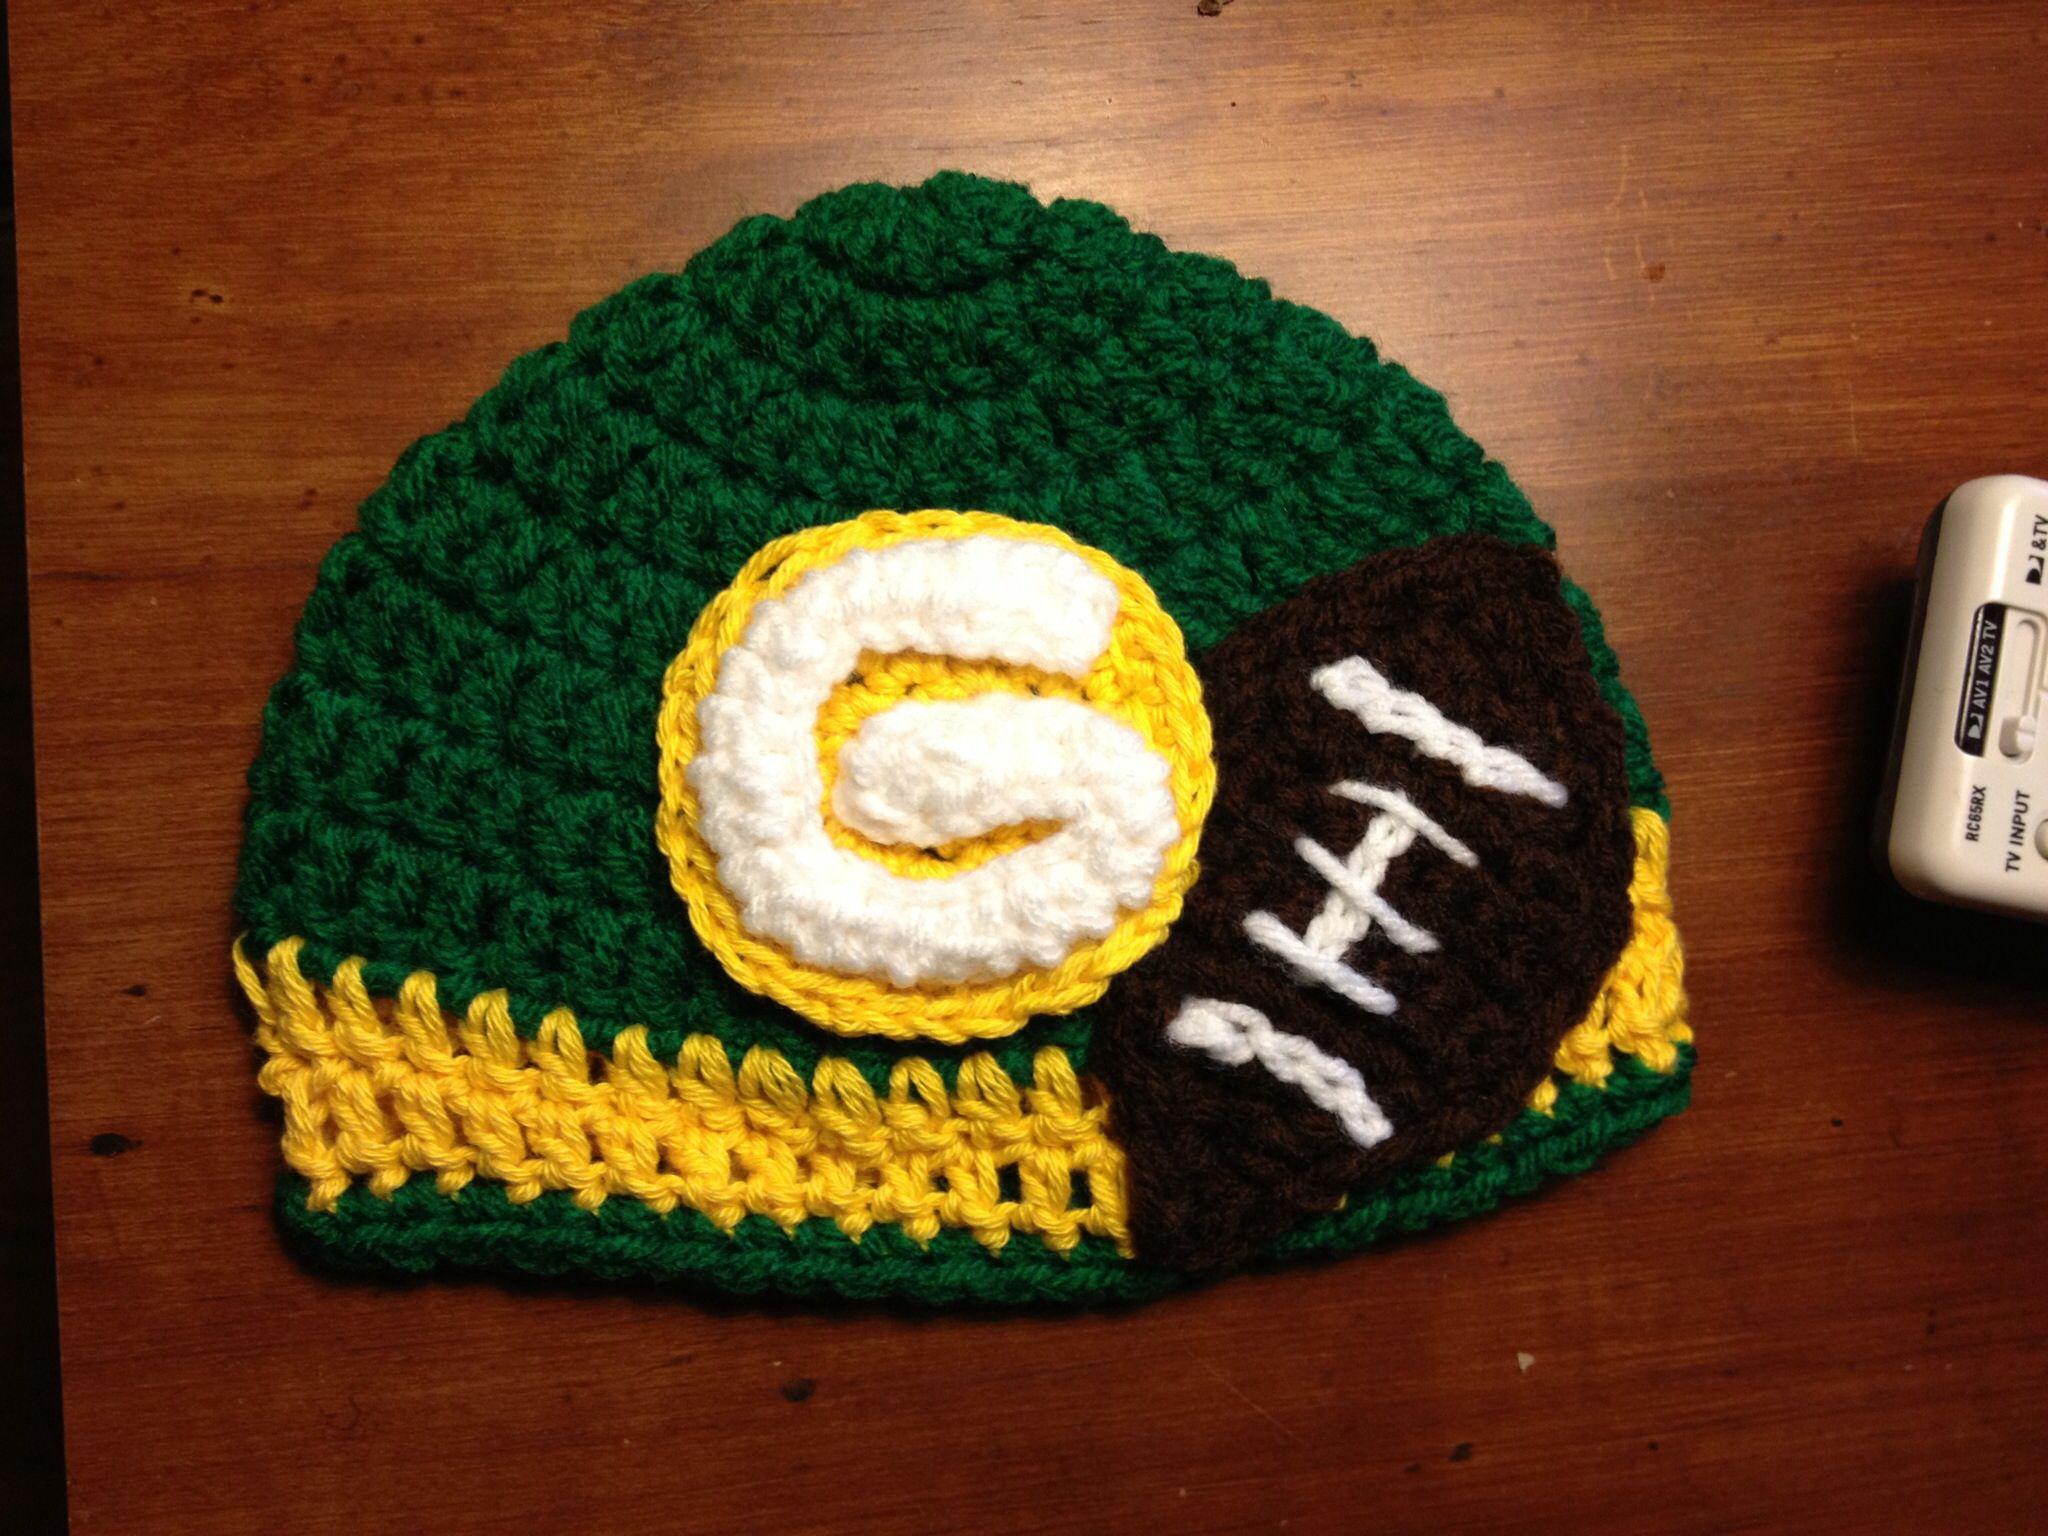 Crochet Green Bay packer hat | Crochet | Pinterest